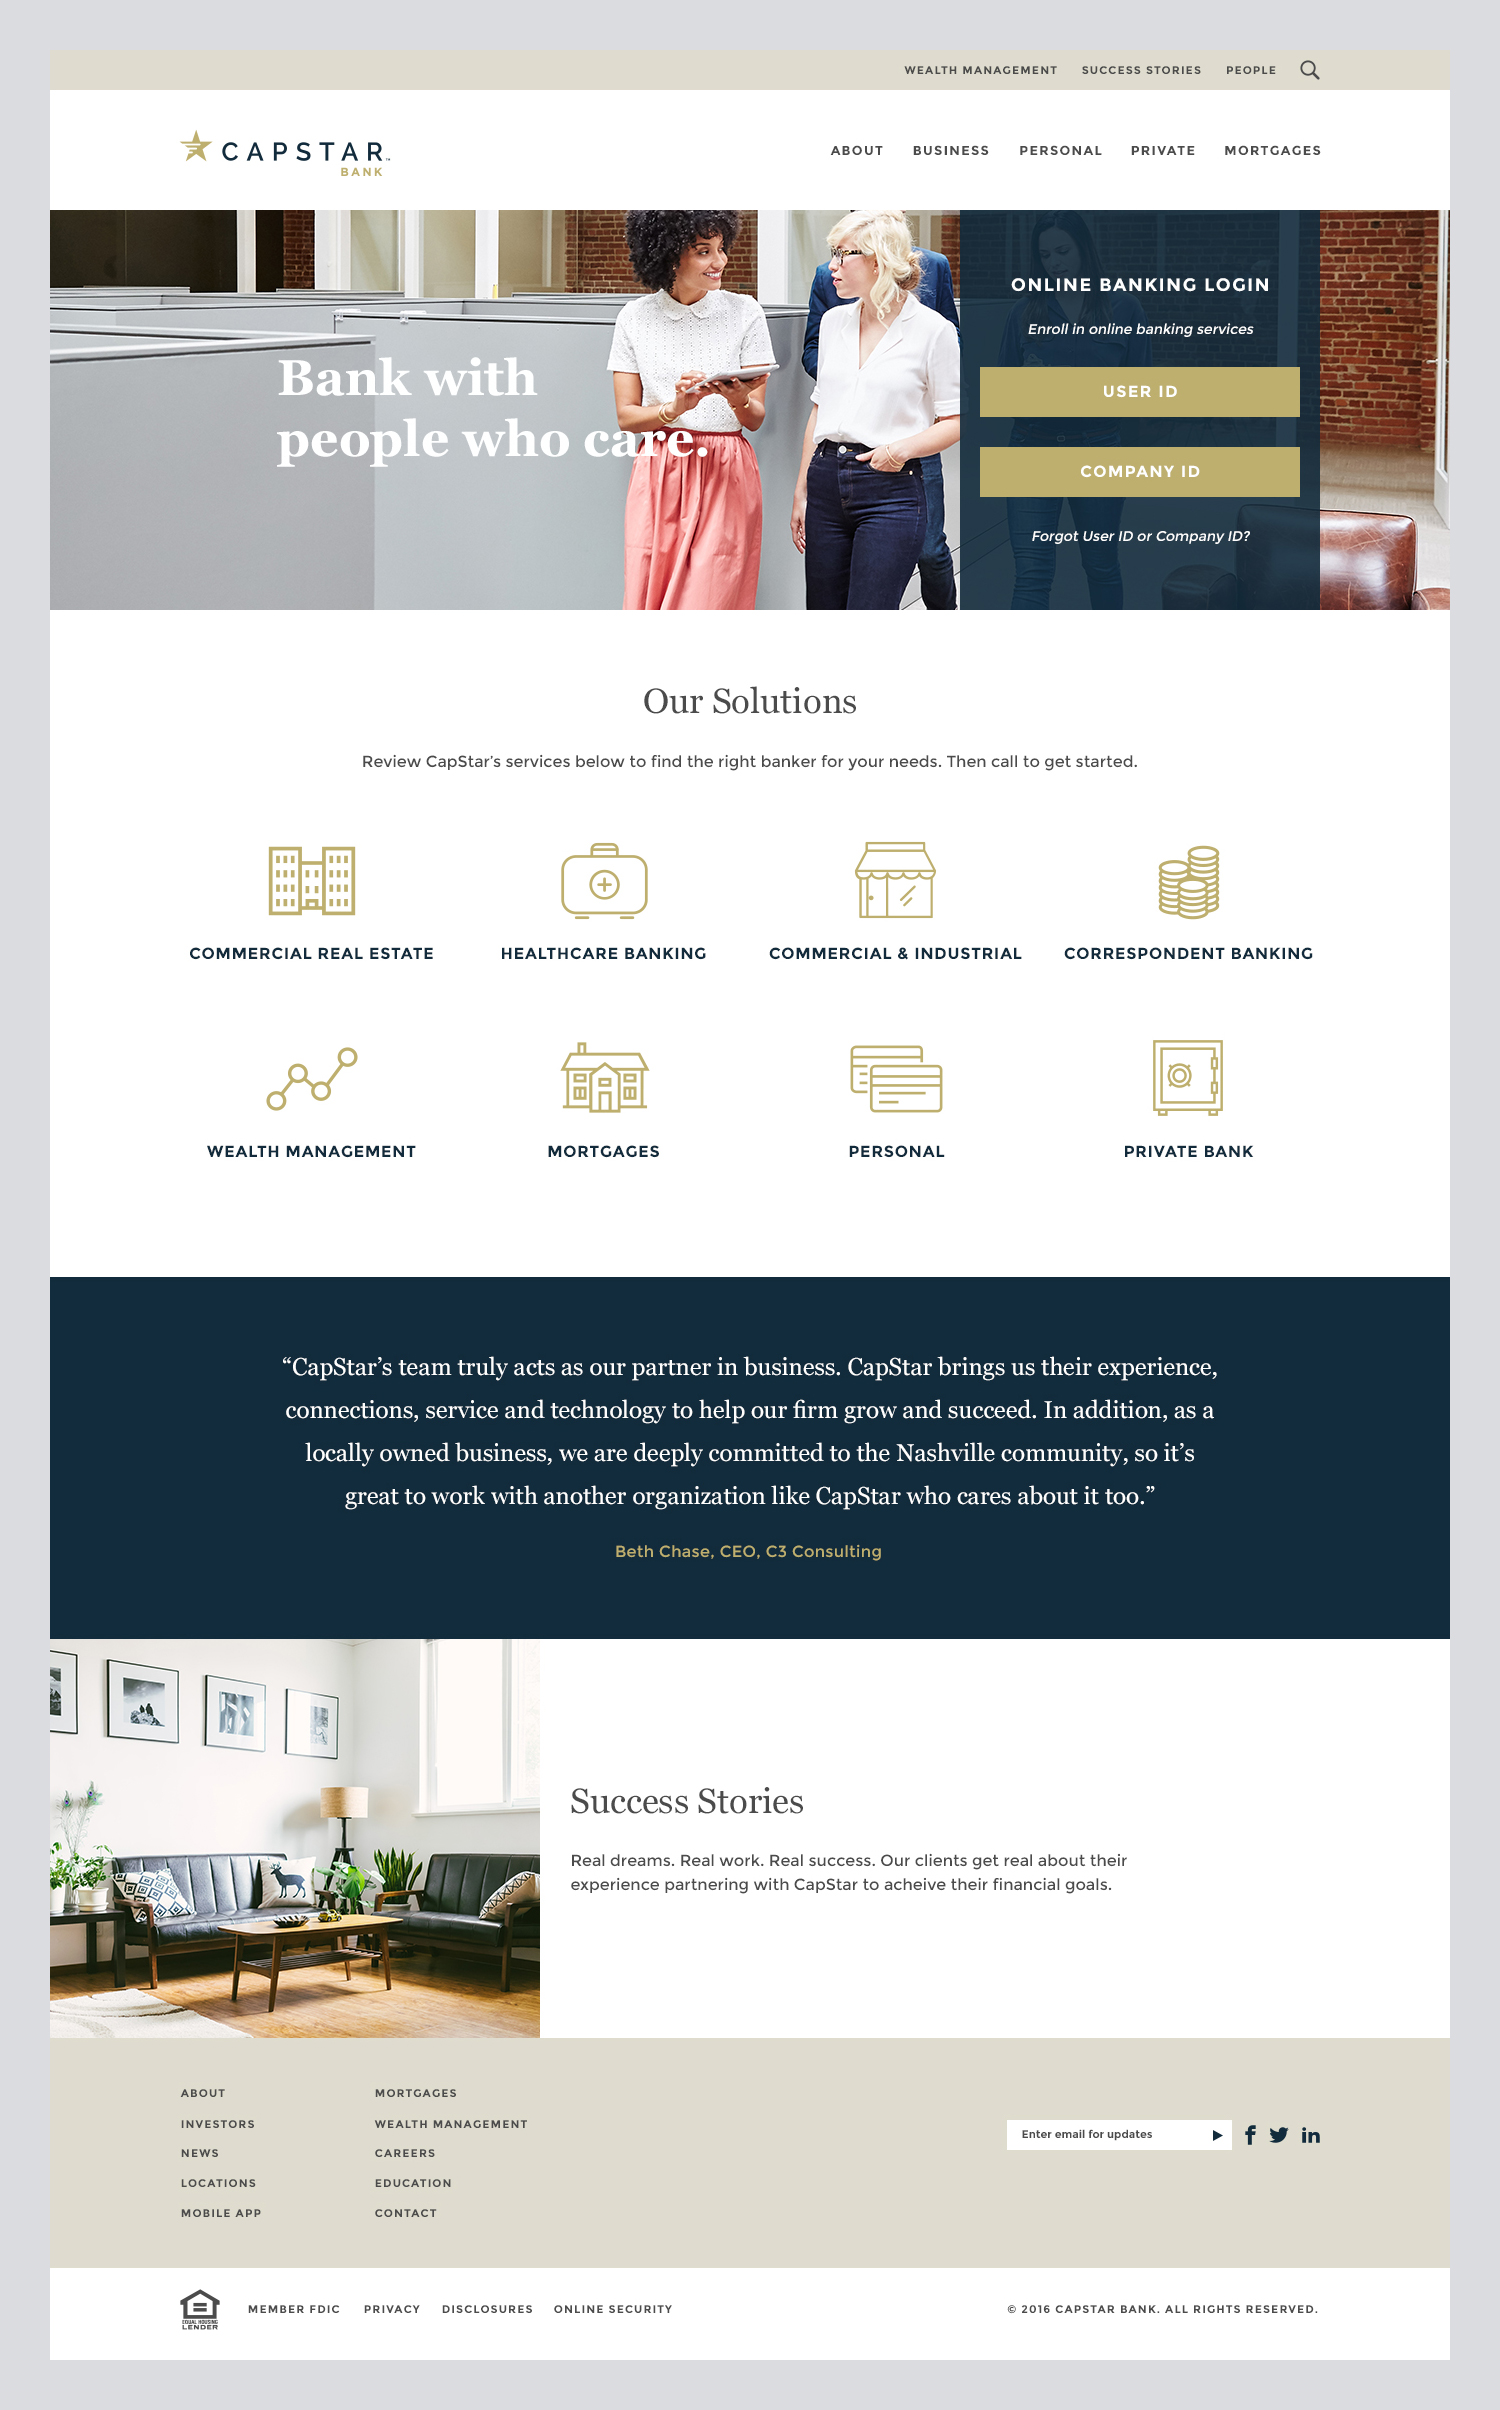 CapStar Bank Website -